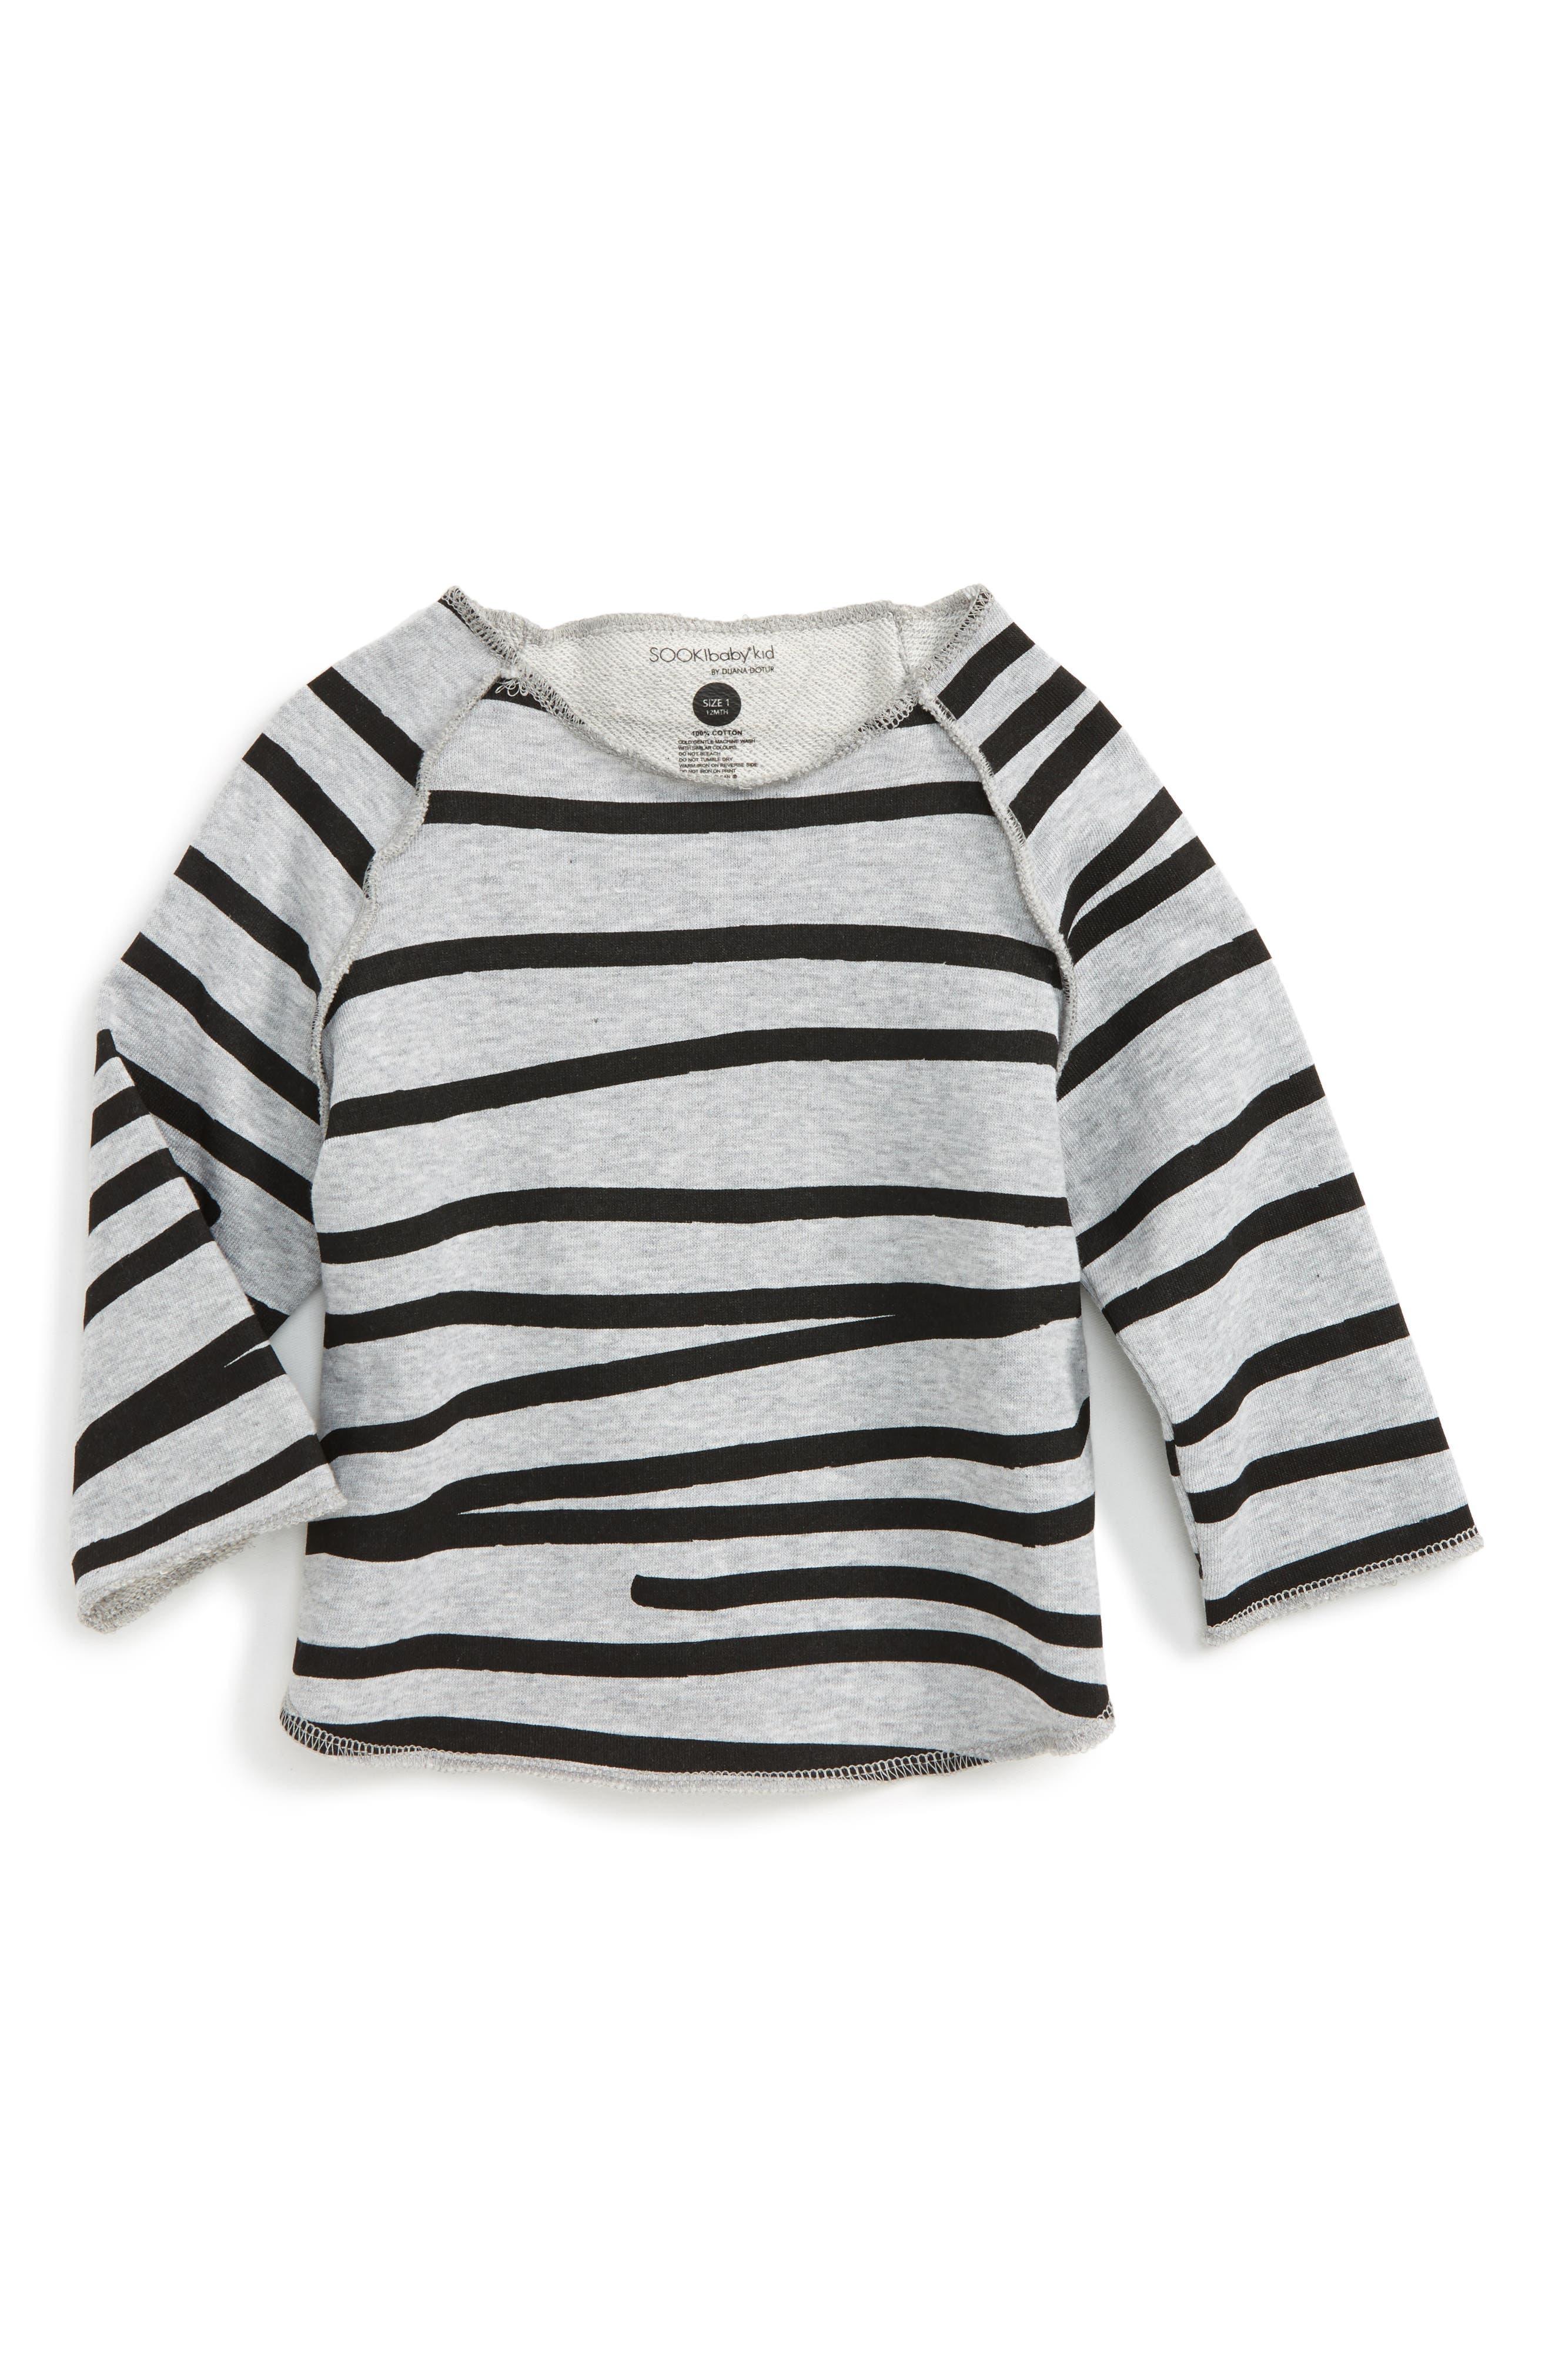 SOOKIbaby Relaxed Stripe Sweatshirt (Baby)